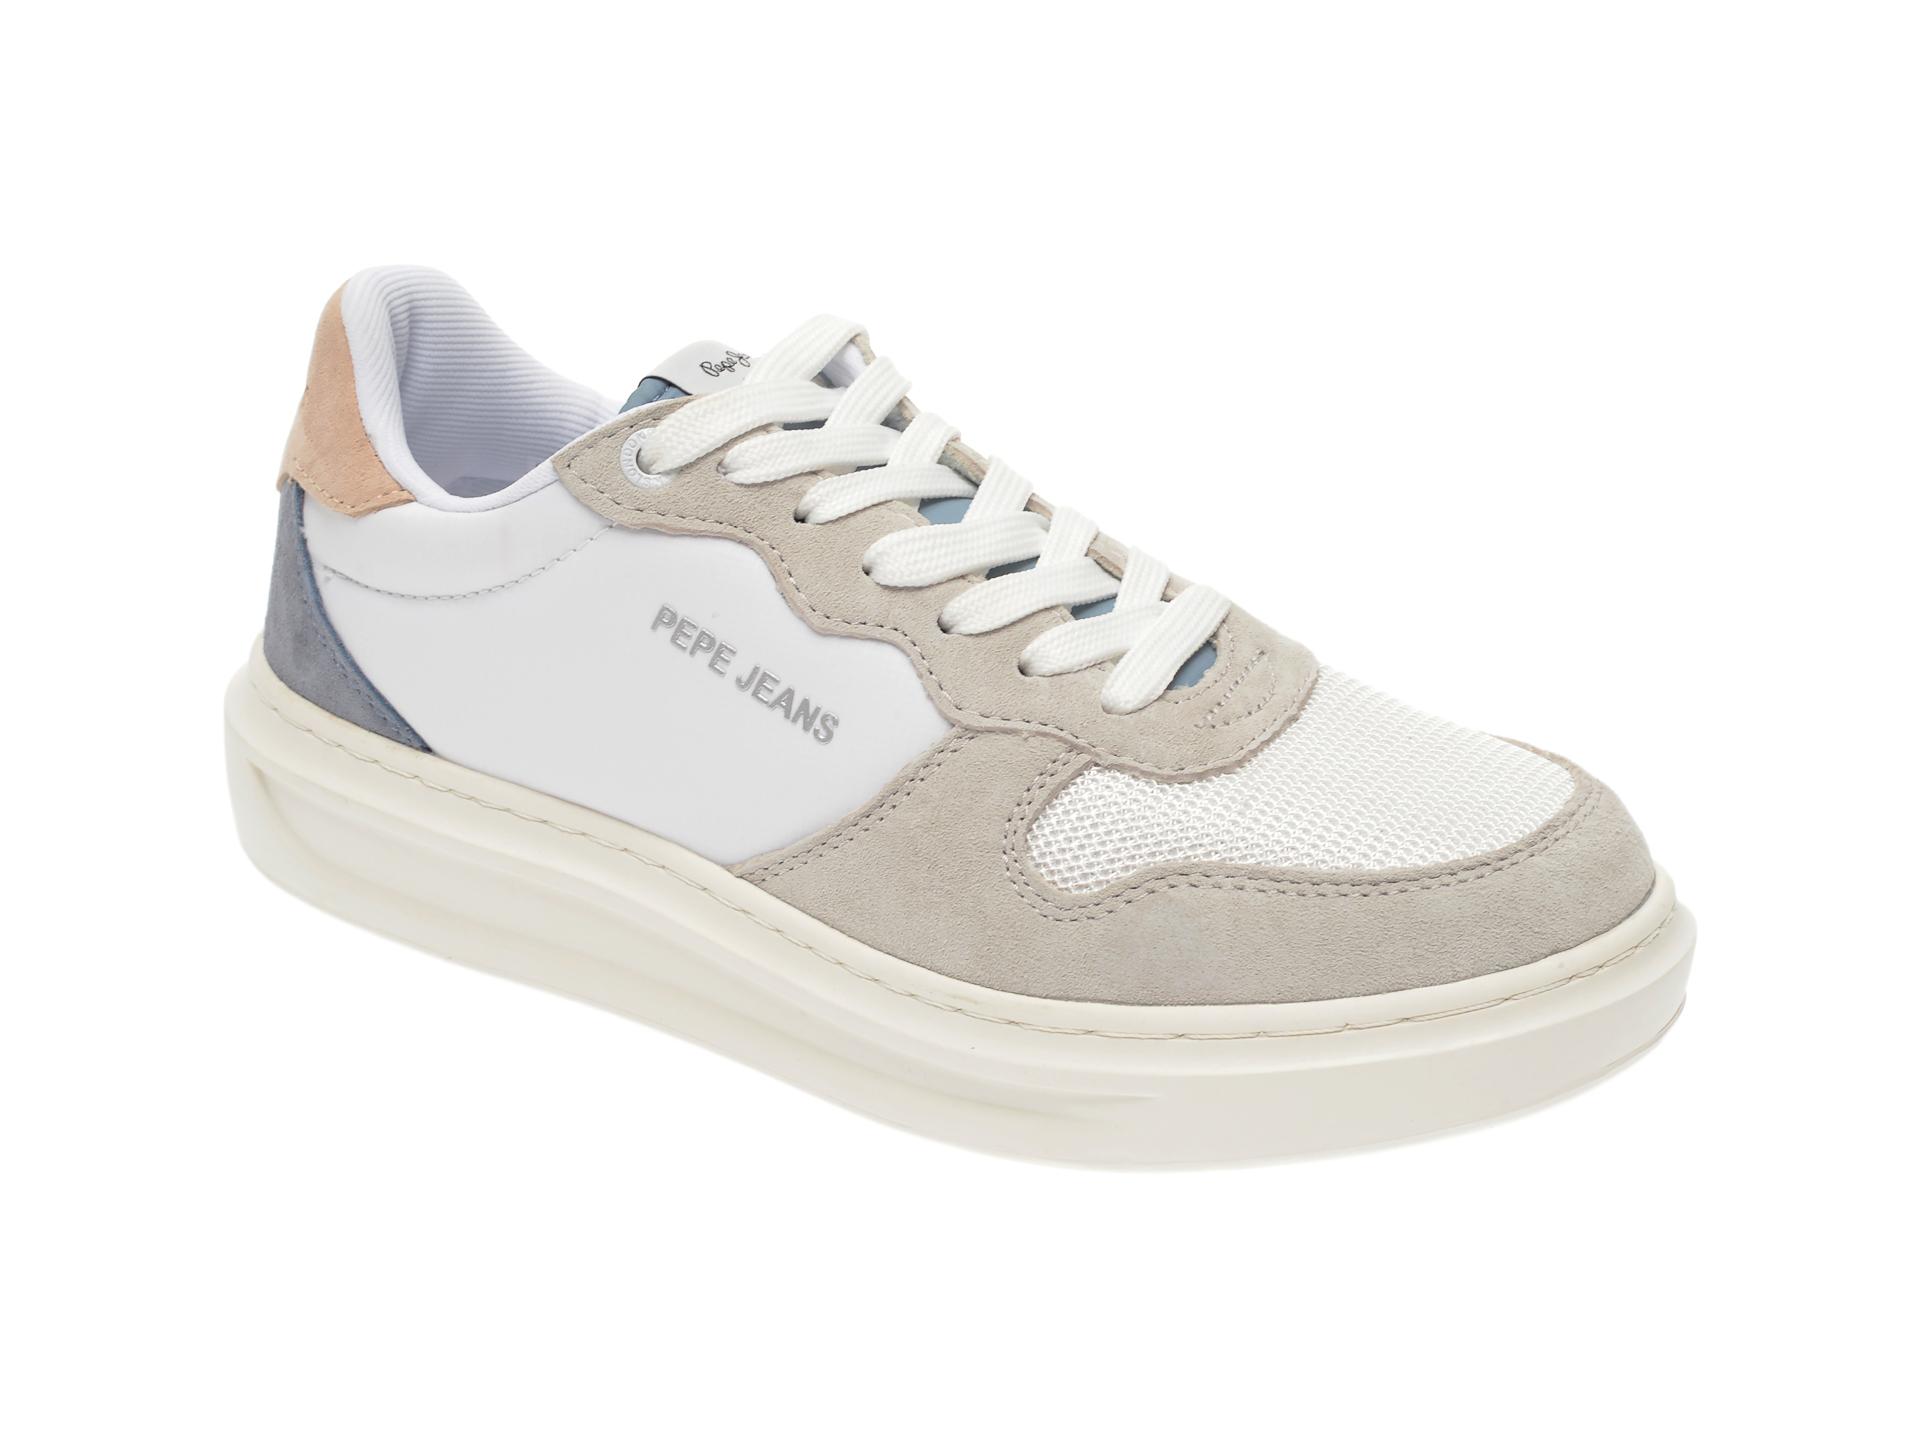 Pantofi sport PEPE JEANS albi, LS30962, din material textil si piele intoarsa imagine